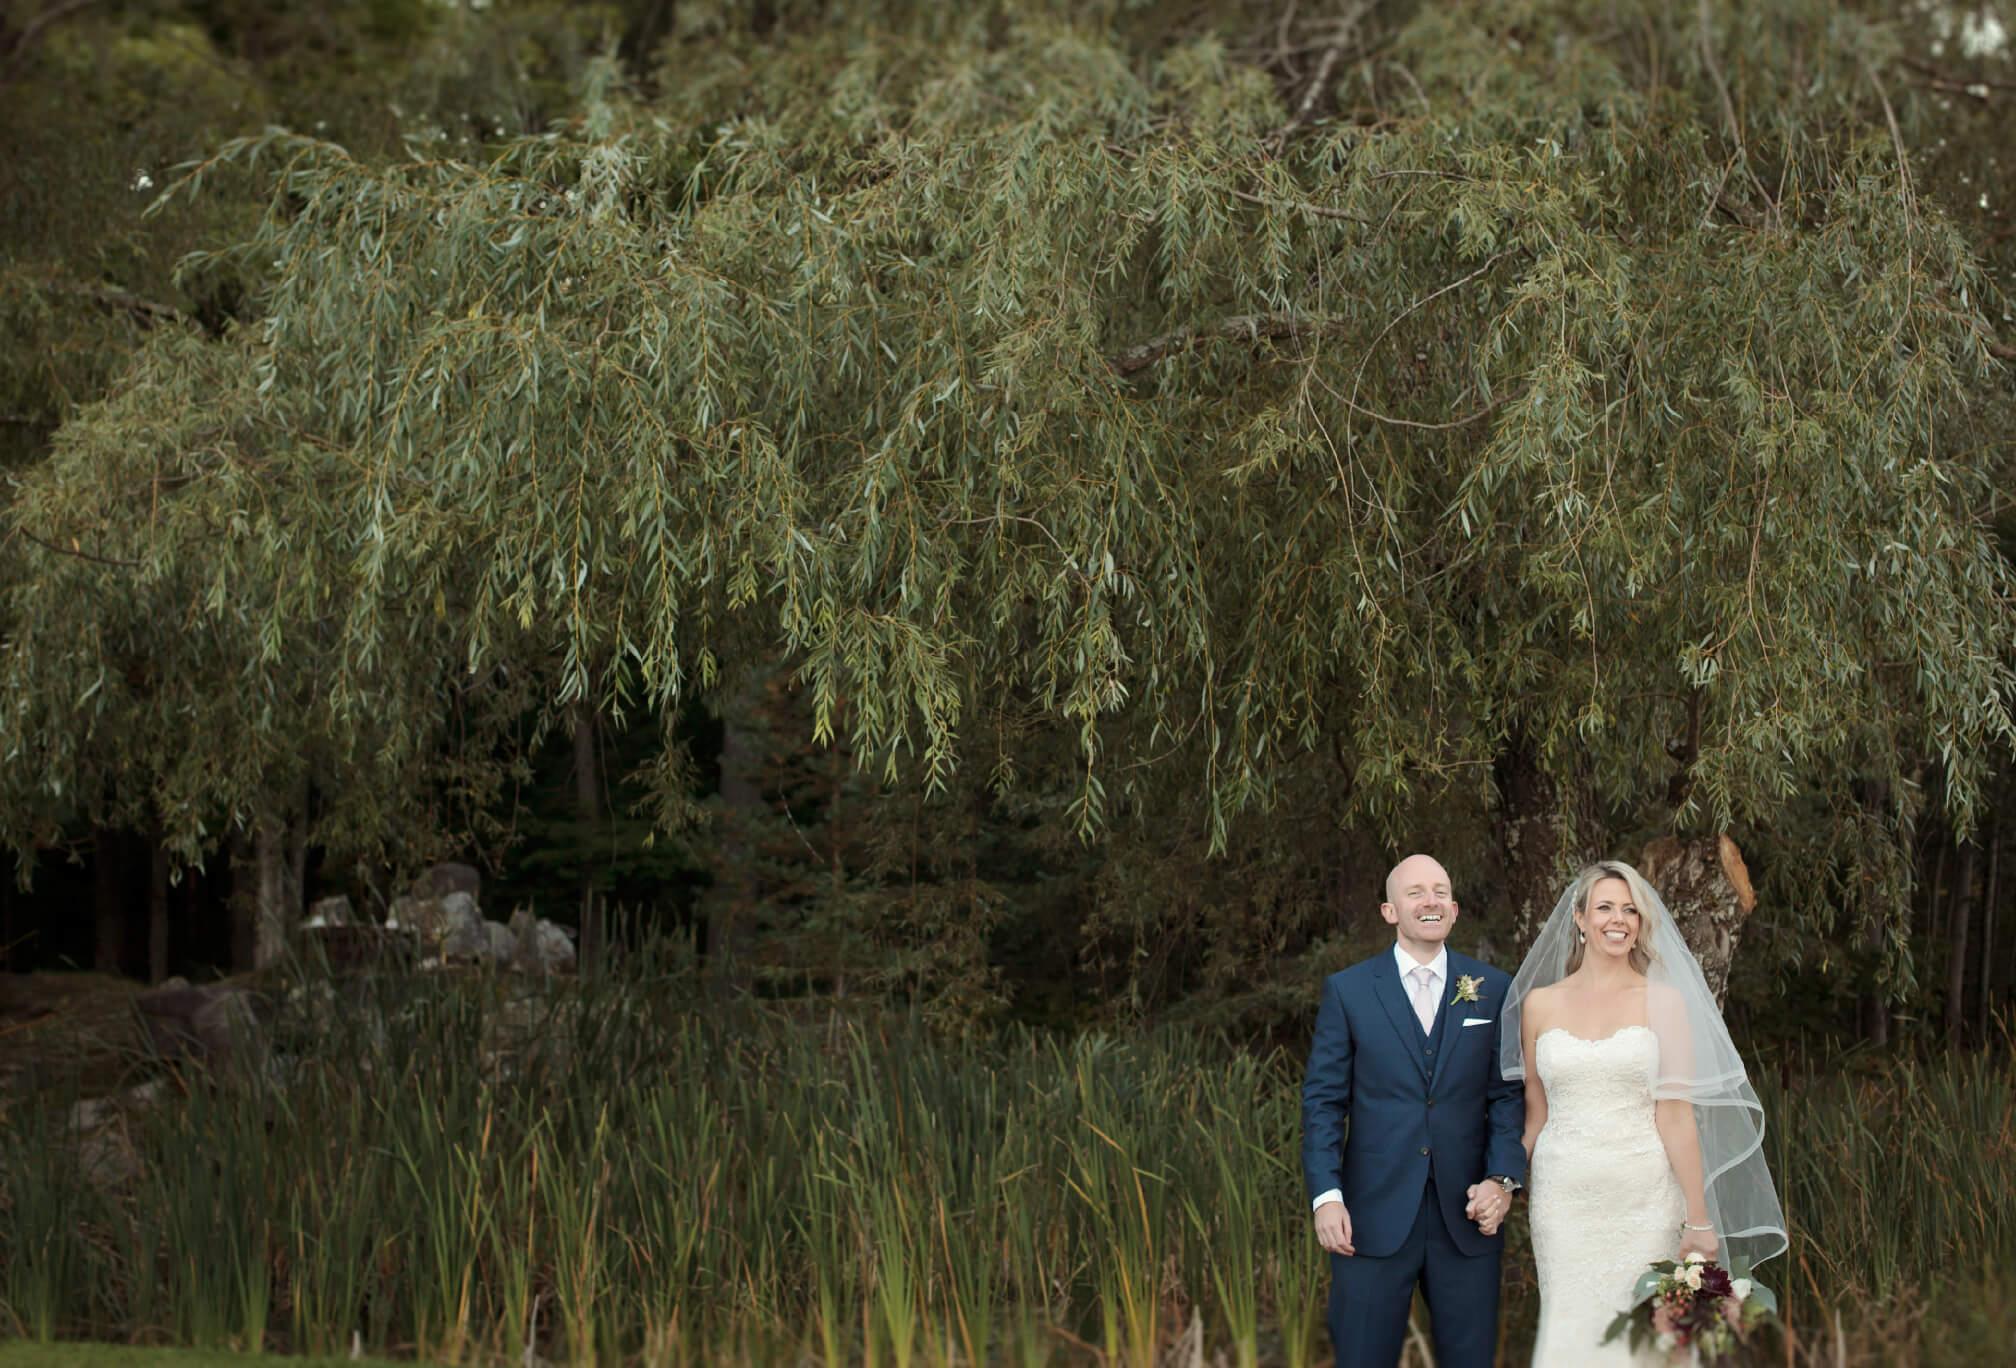 foresrt backdrop wedding photography muskoka